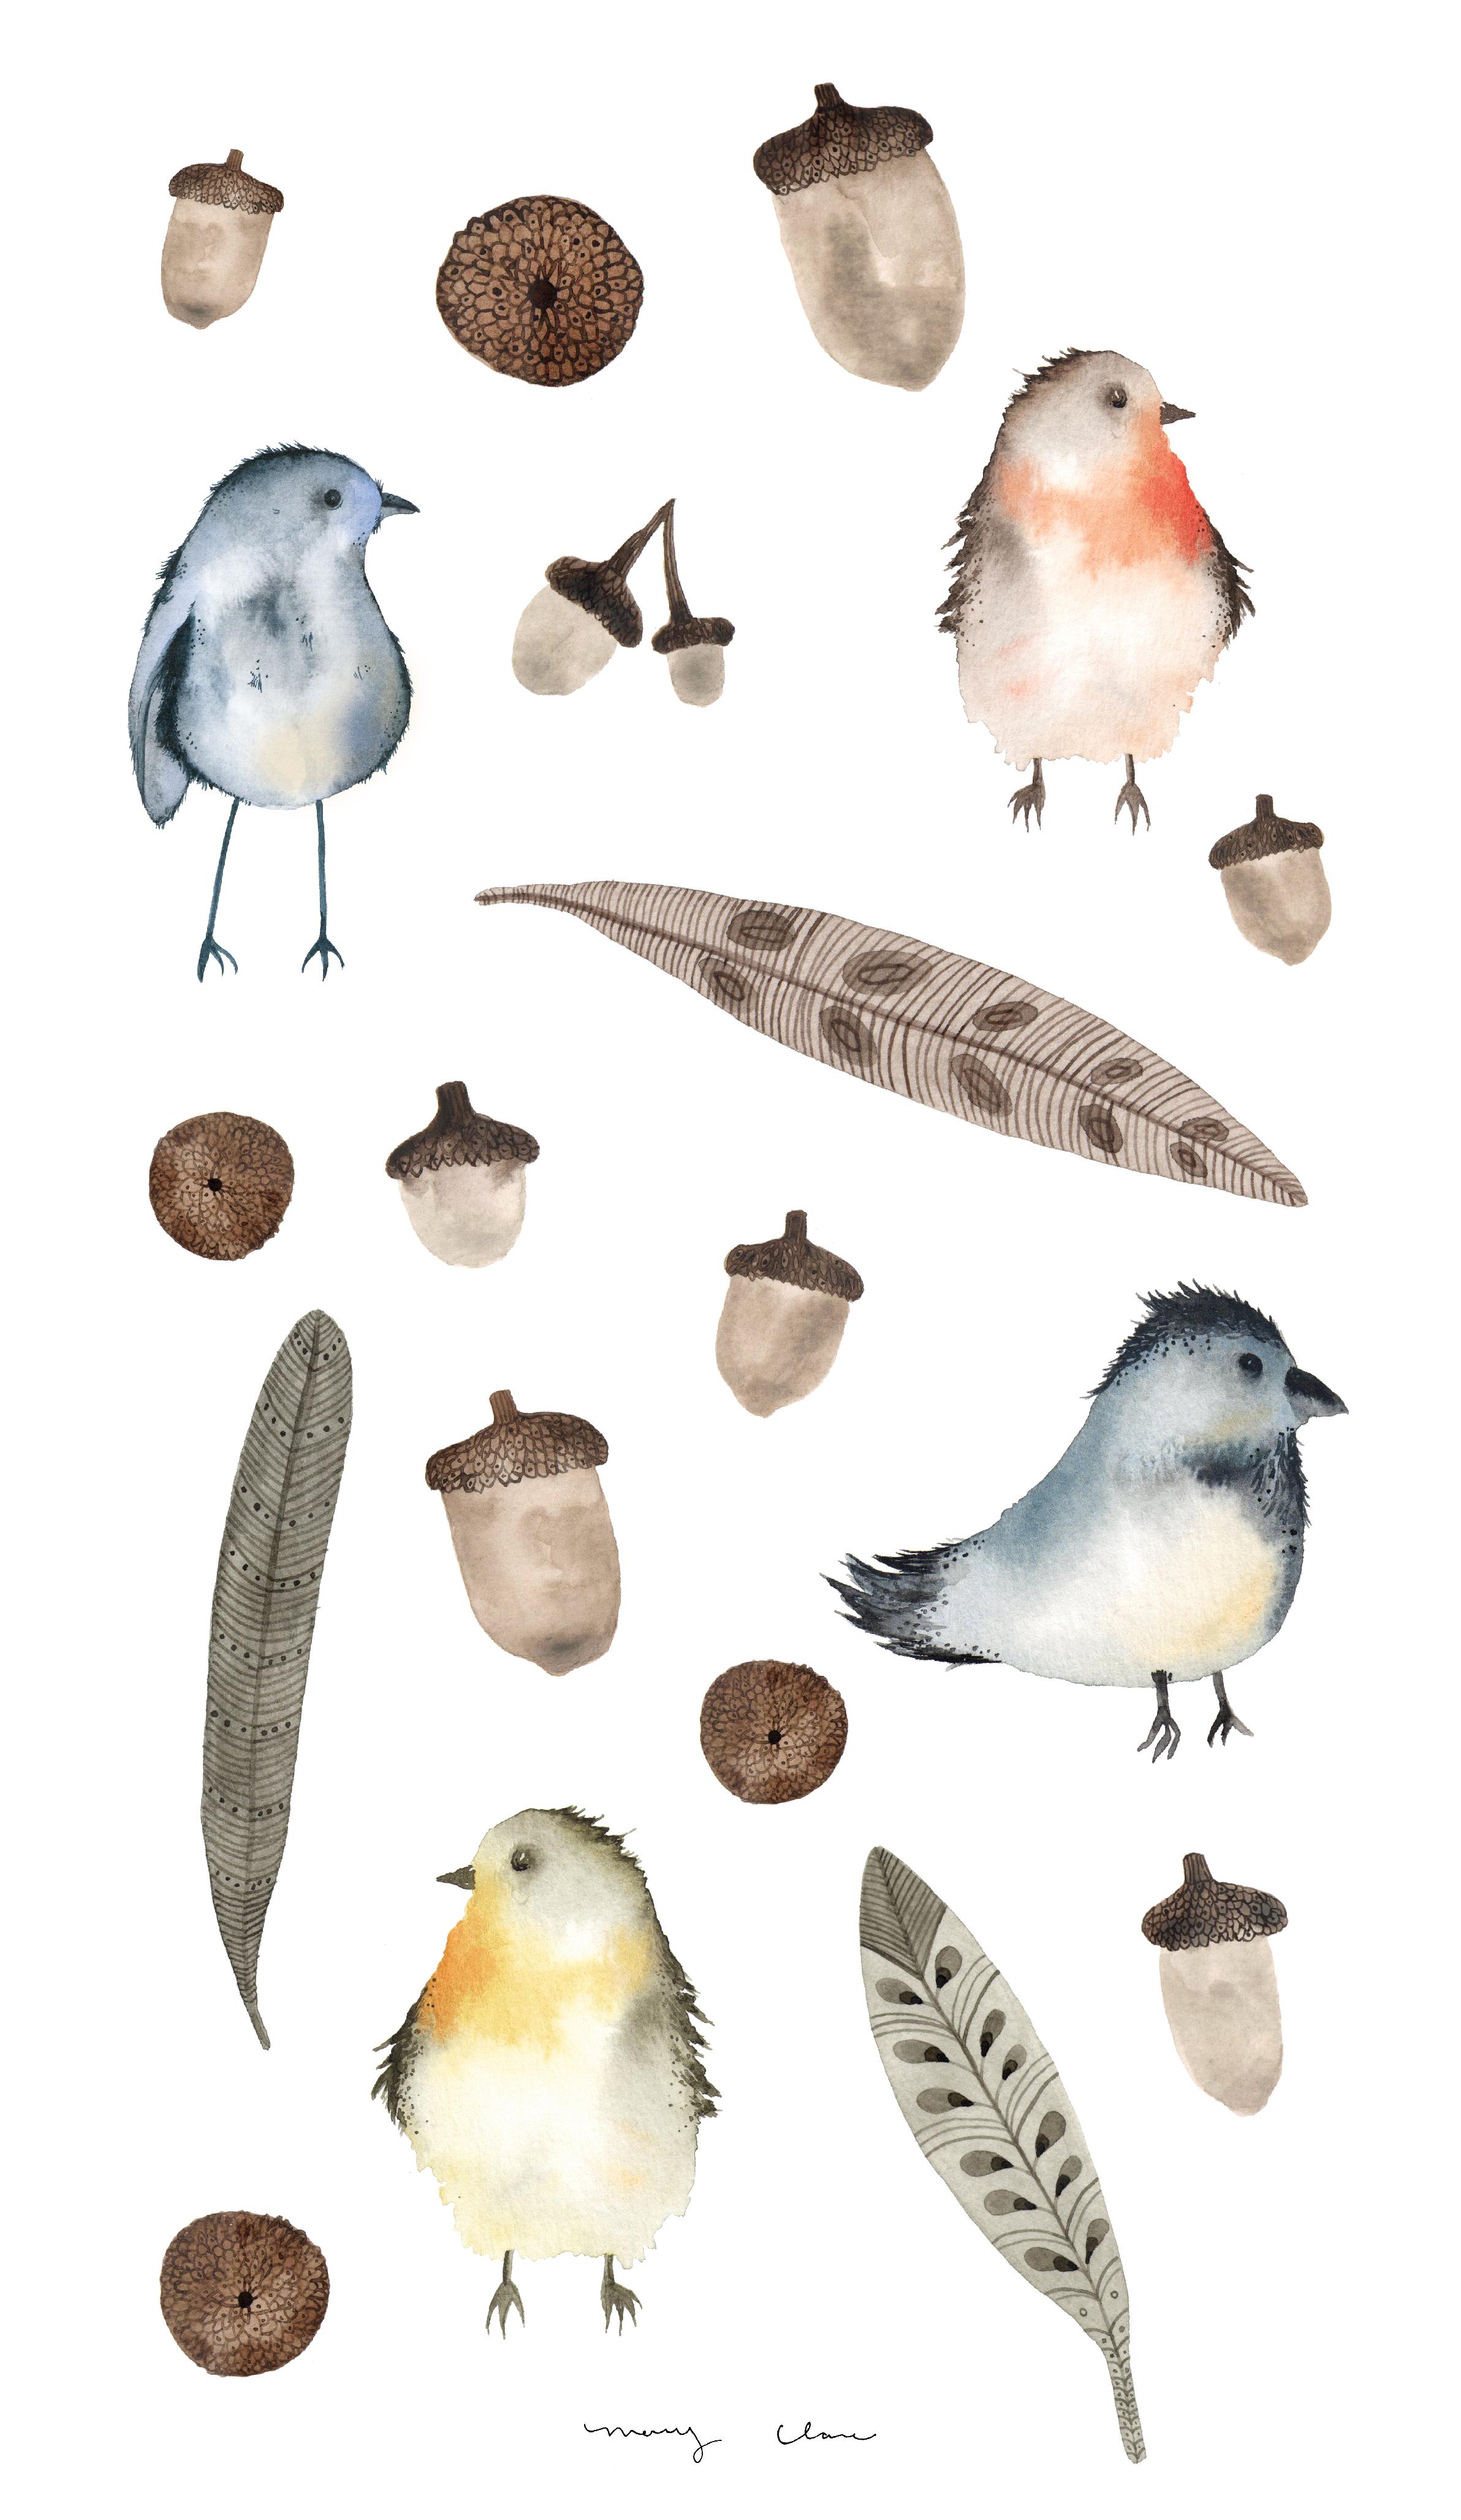 woodlandBirds-maryclarewilkie-01.jpg